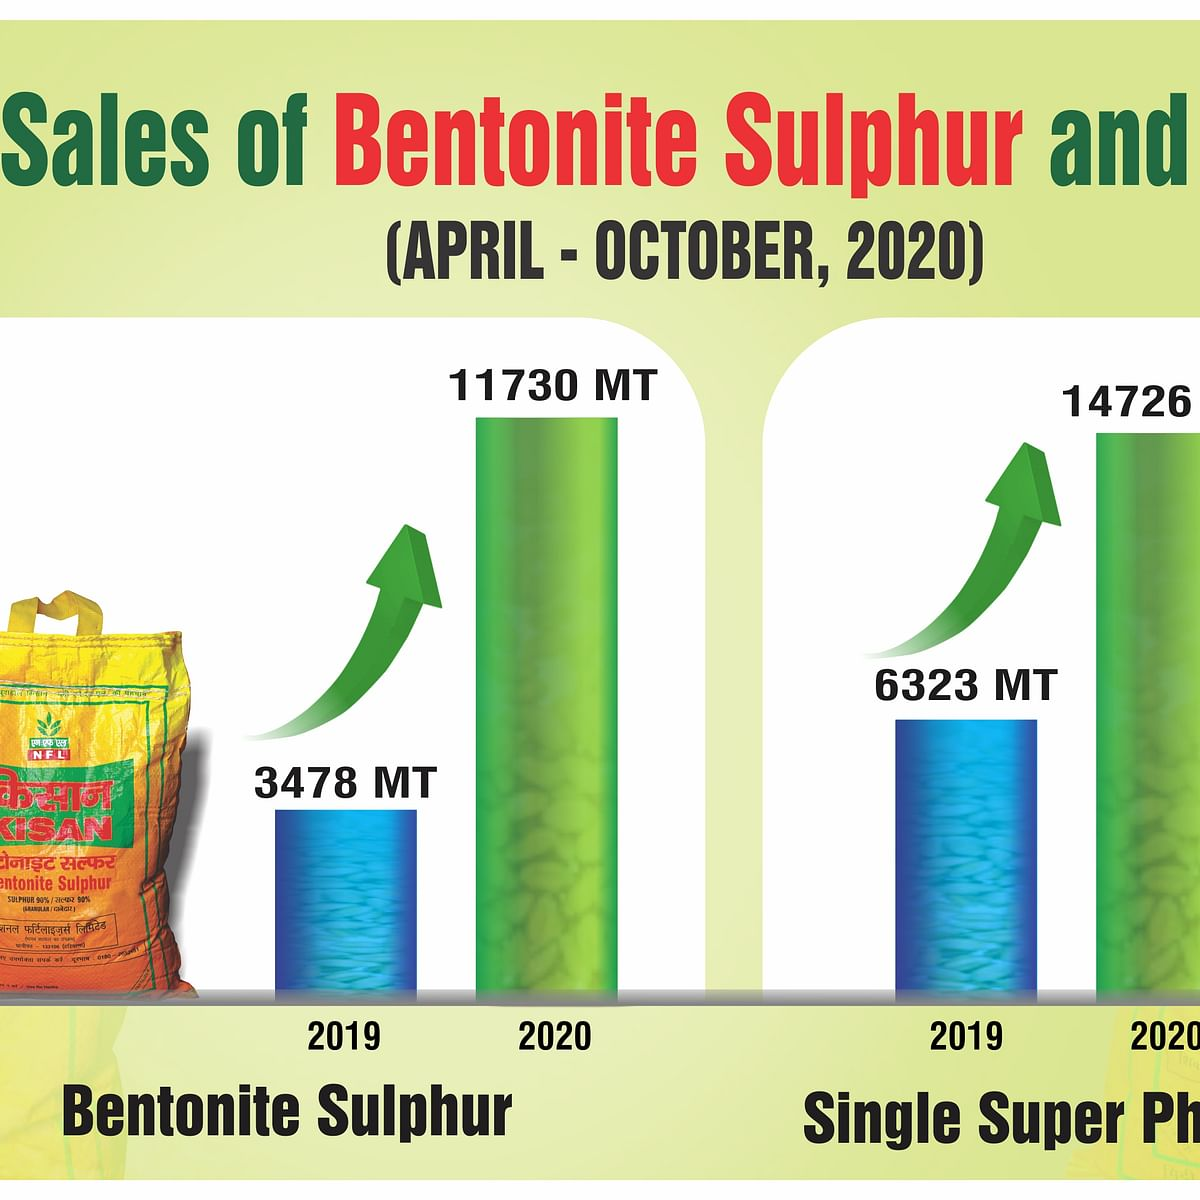 Madhya Pradesh: National Fertilizers Limited registers steep growth in sale of SSP and Bentonite Sulphur